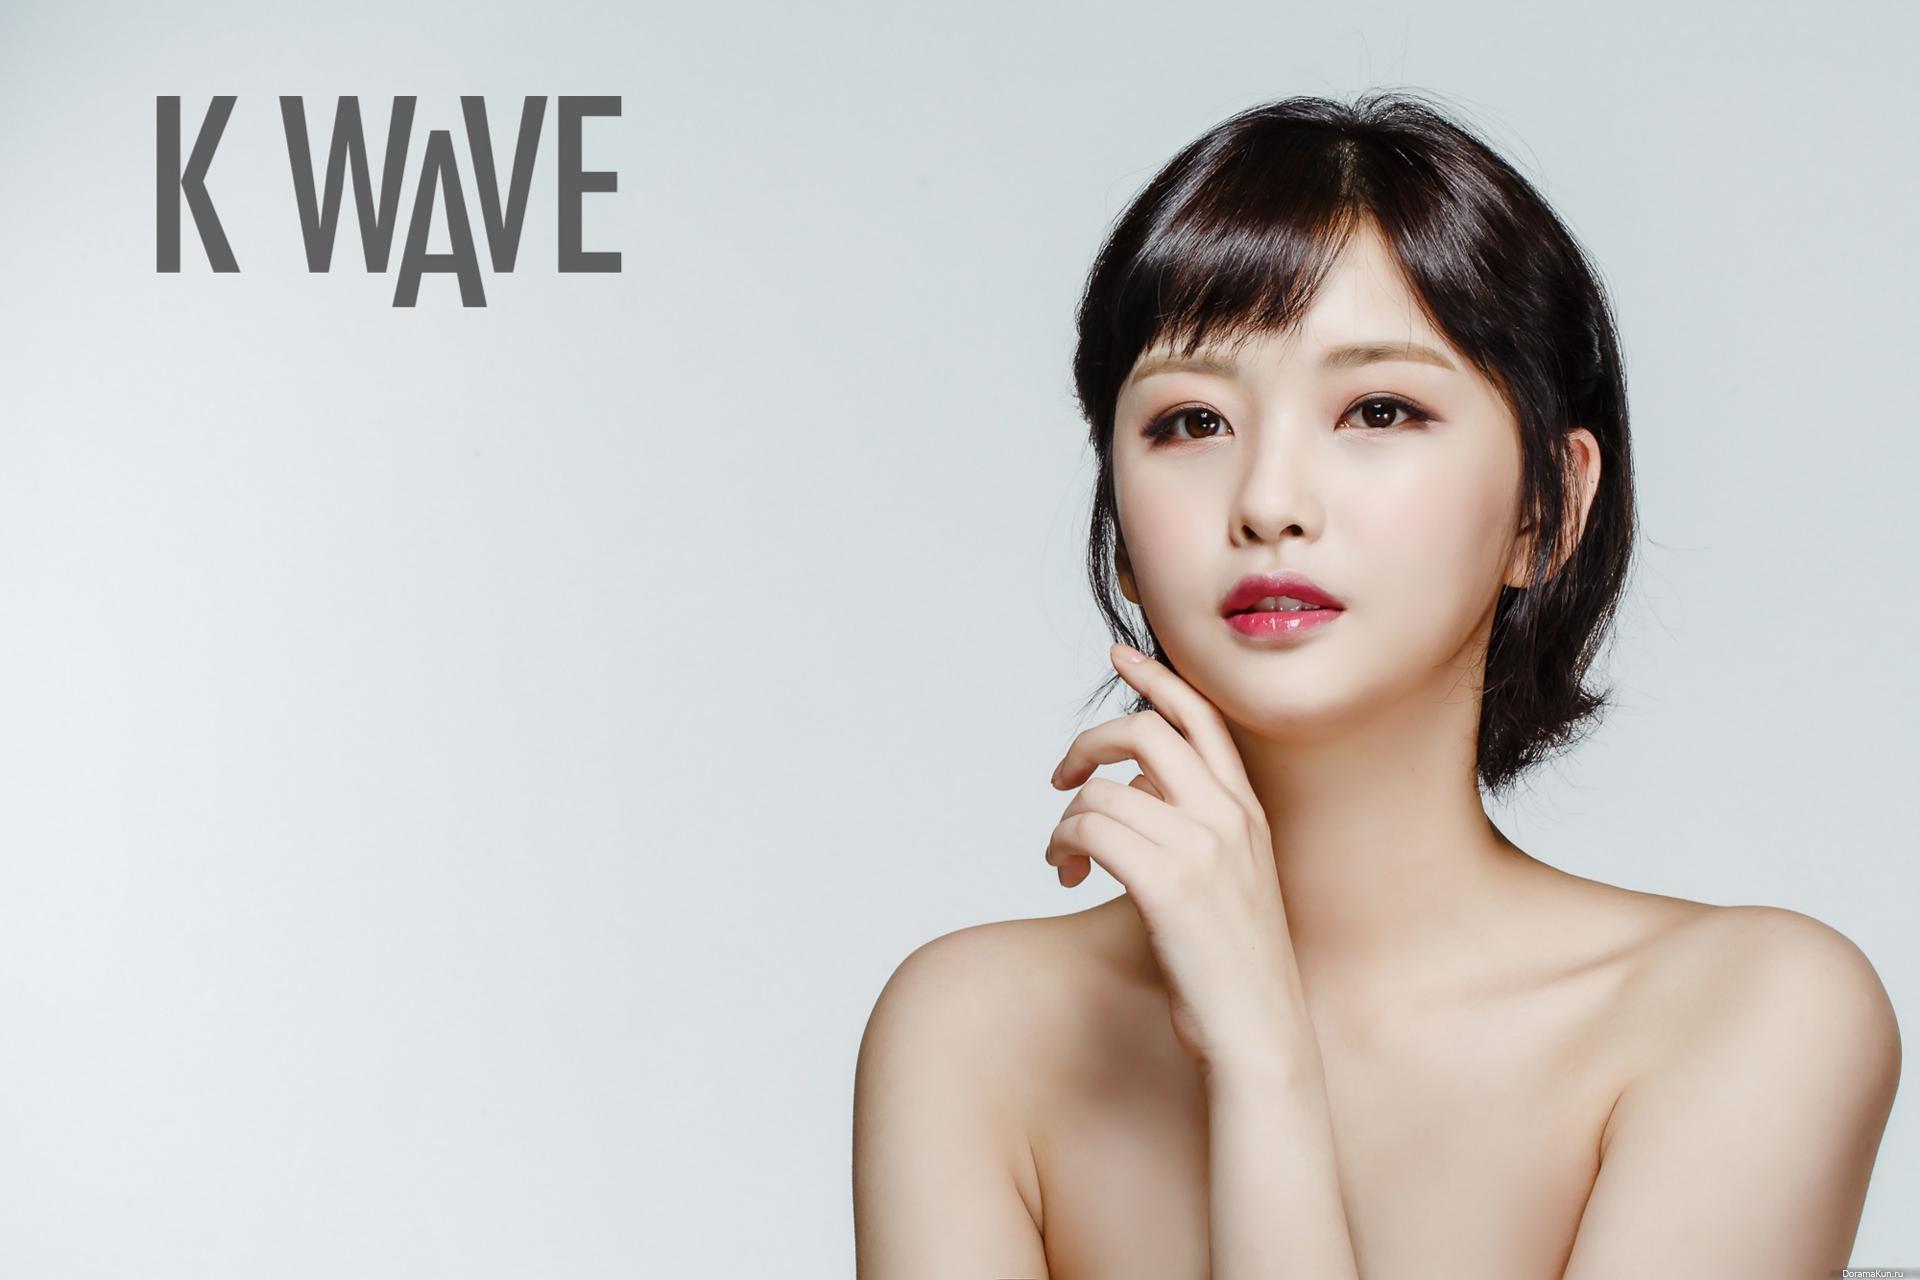 Go Mal Suk для K Wave January 2016 Фотосессии